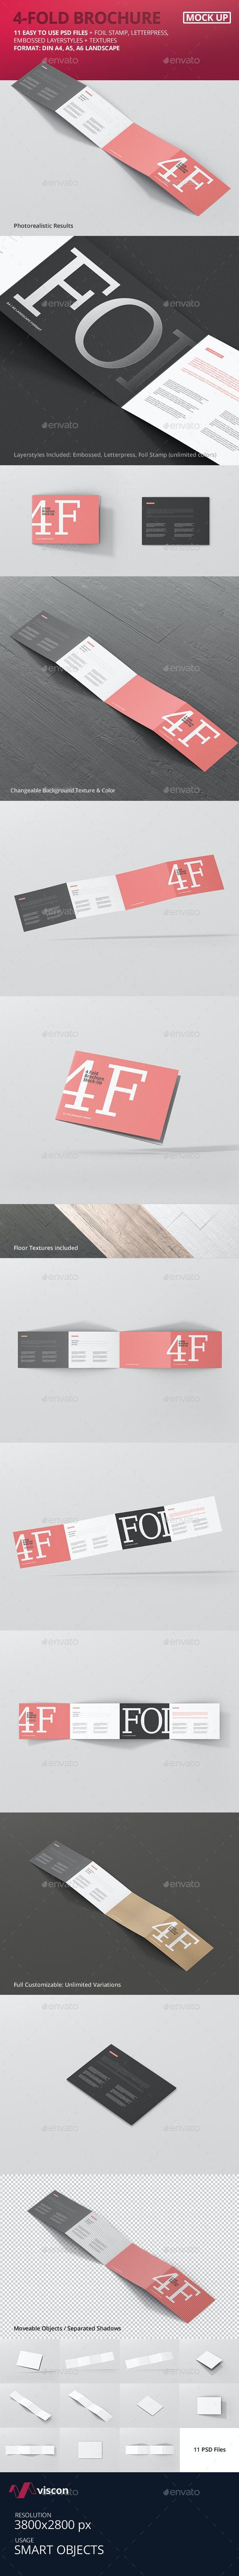 4-Fold Brochure Mockup - Din A4 A5 A6 Landscape - Brochures Print